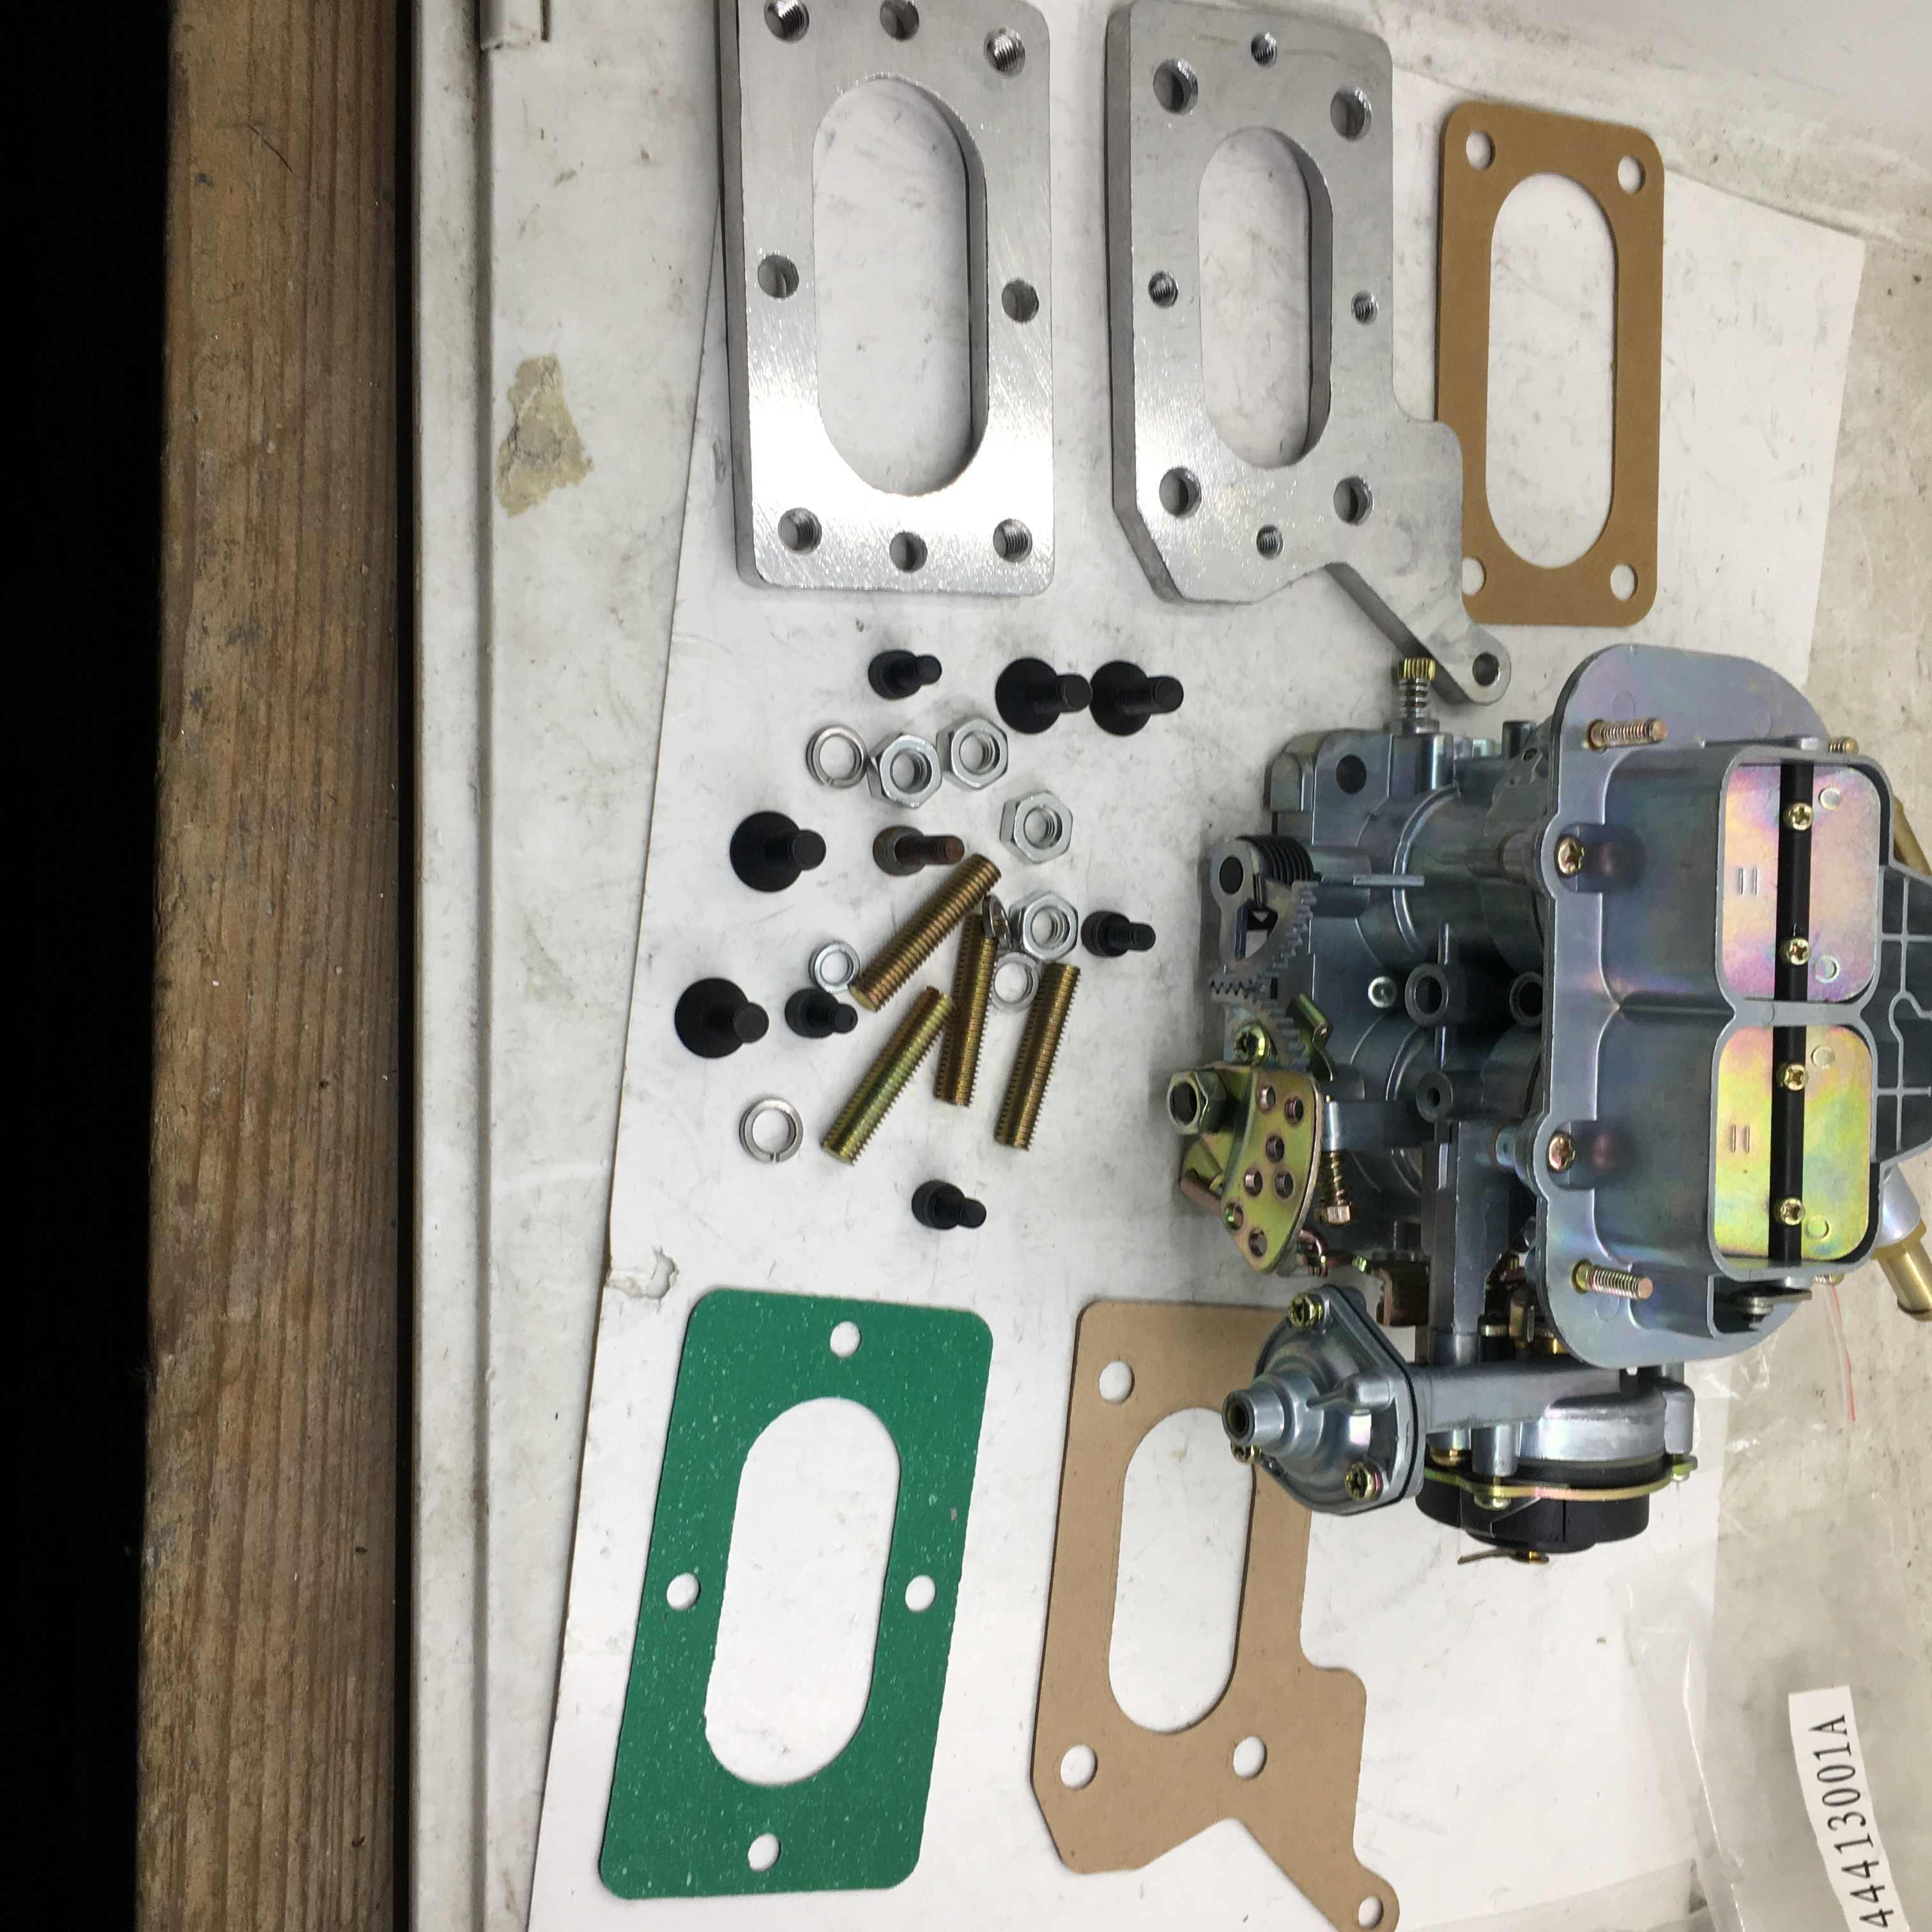 Details about  /Weber Carburetor Manifold Adapter Mazda B2600 Mitsubishi Montero CARB 38//38 DGES